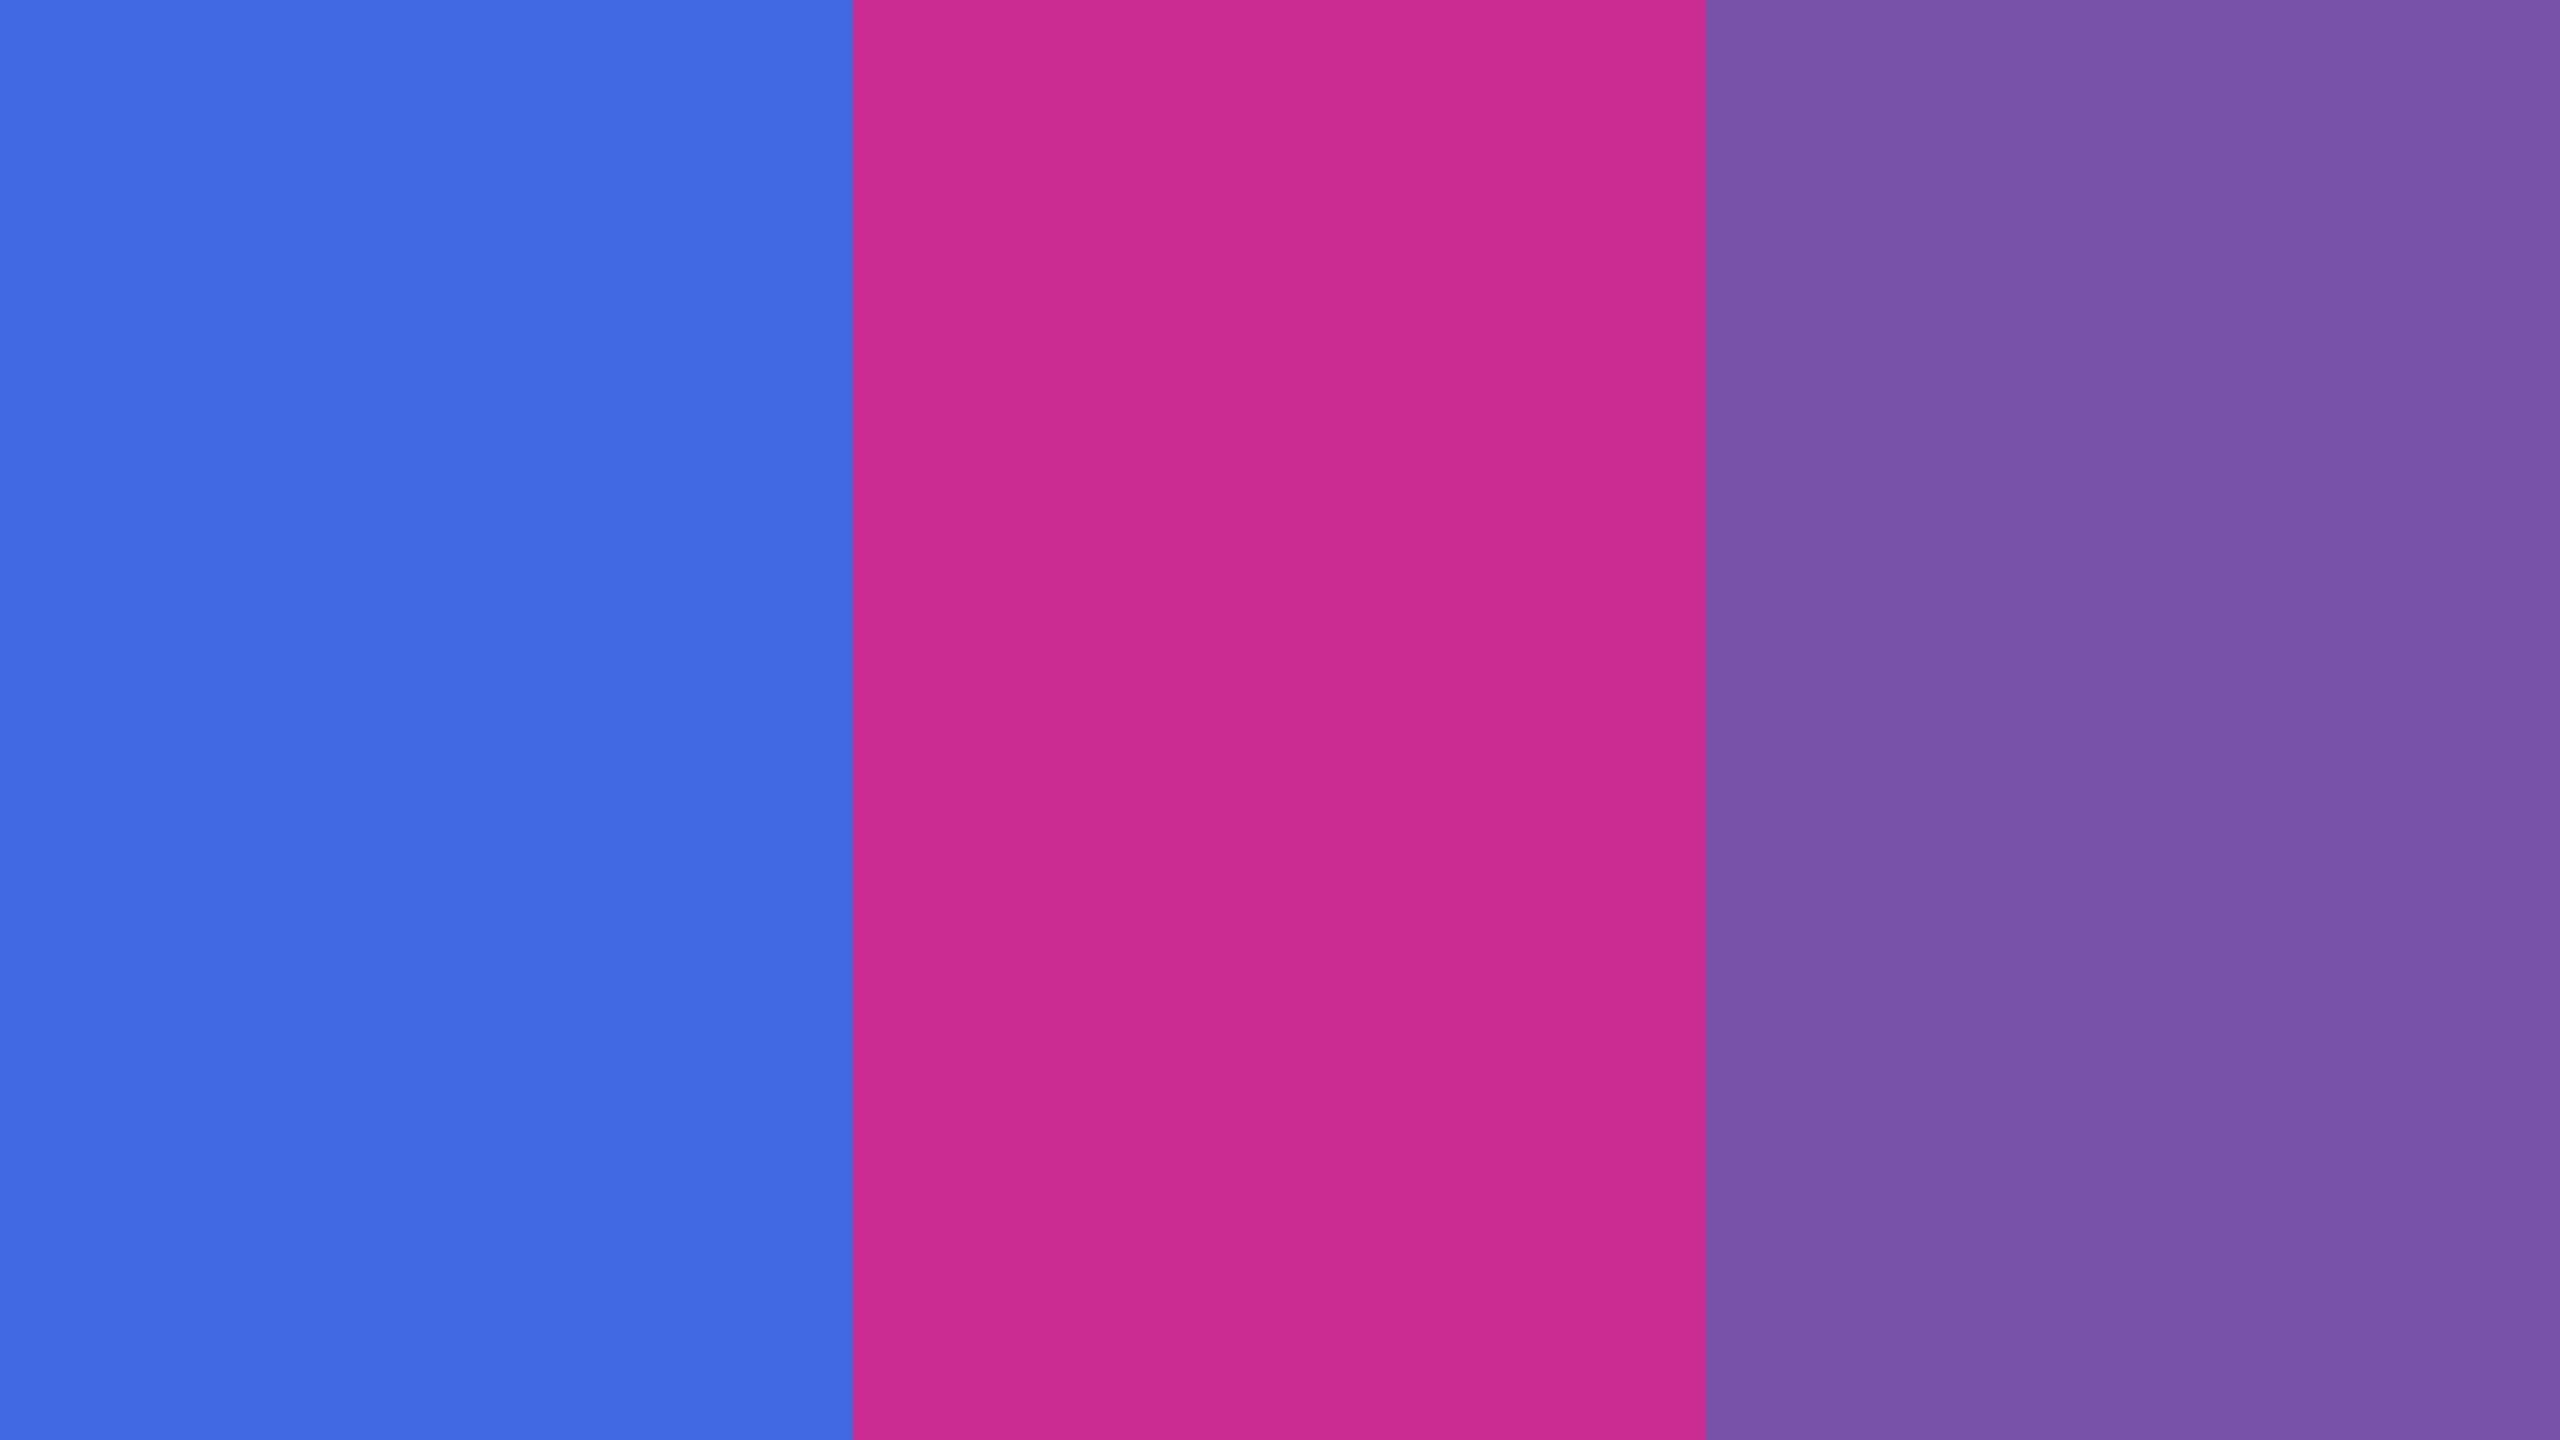 Royal Blue Web Royal Fuchsia and Royal Purple Three Color Background 2560x1440